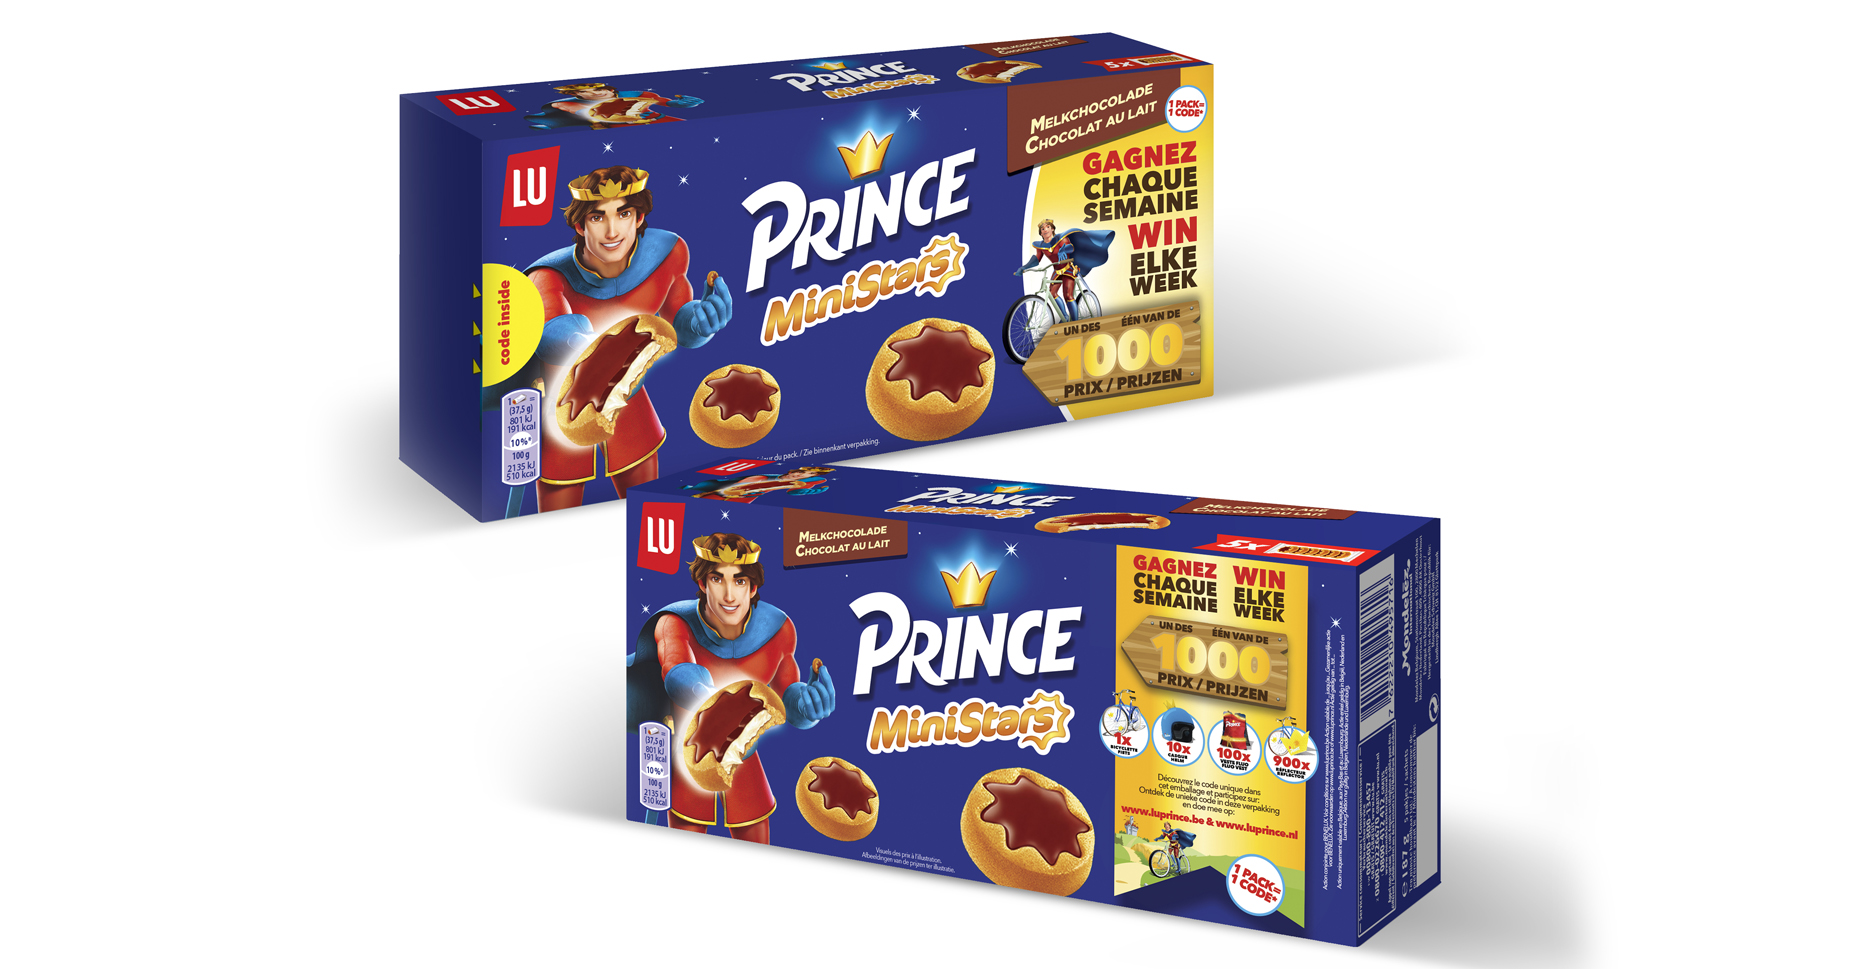 Prince_case_0006.jpg